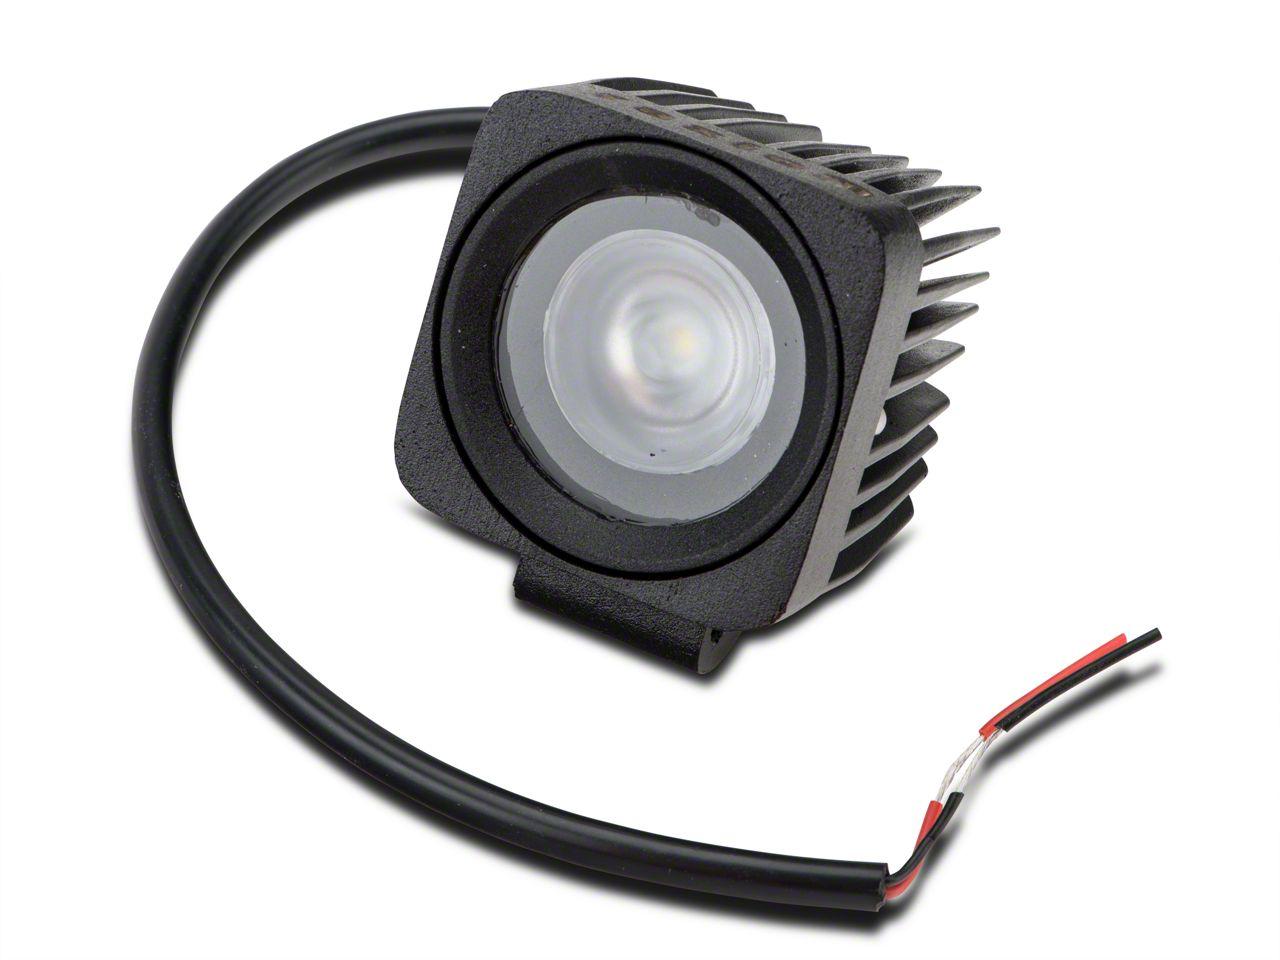 Raxiom 2.5 in. Square LED Light - Flood Beam